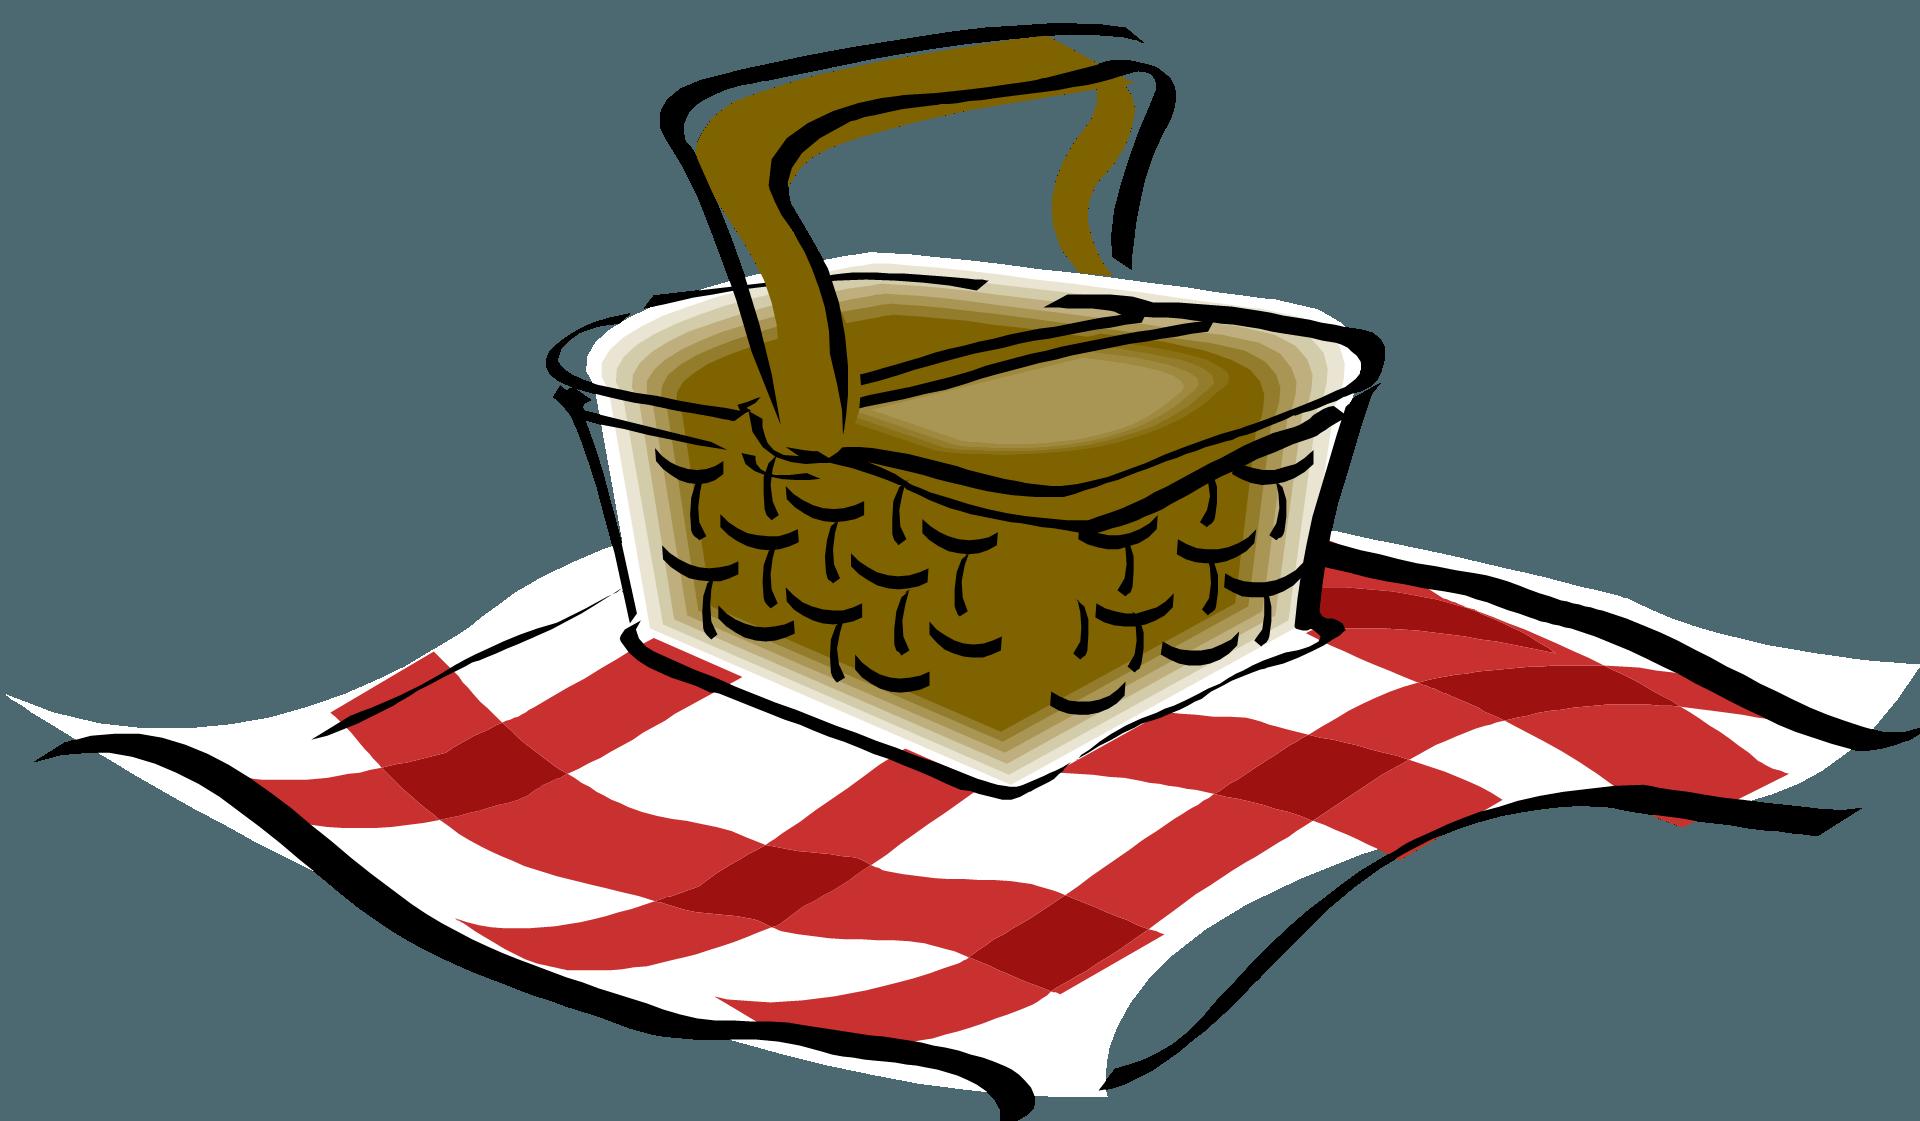 Picnic Basket clipart picnic mat ESF Bradbury ESF School Picnic